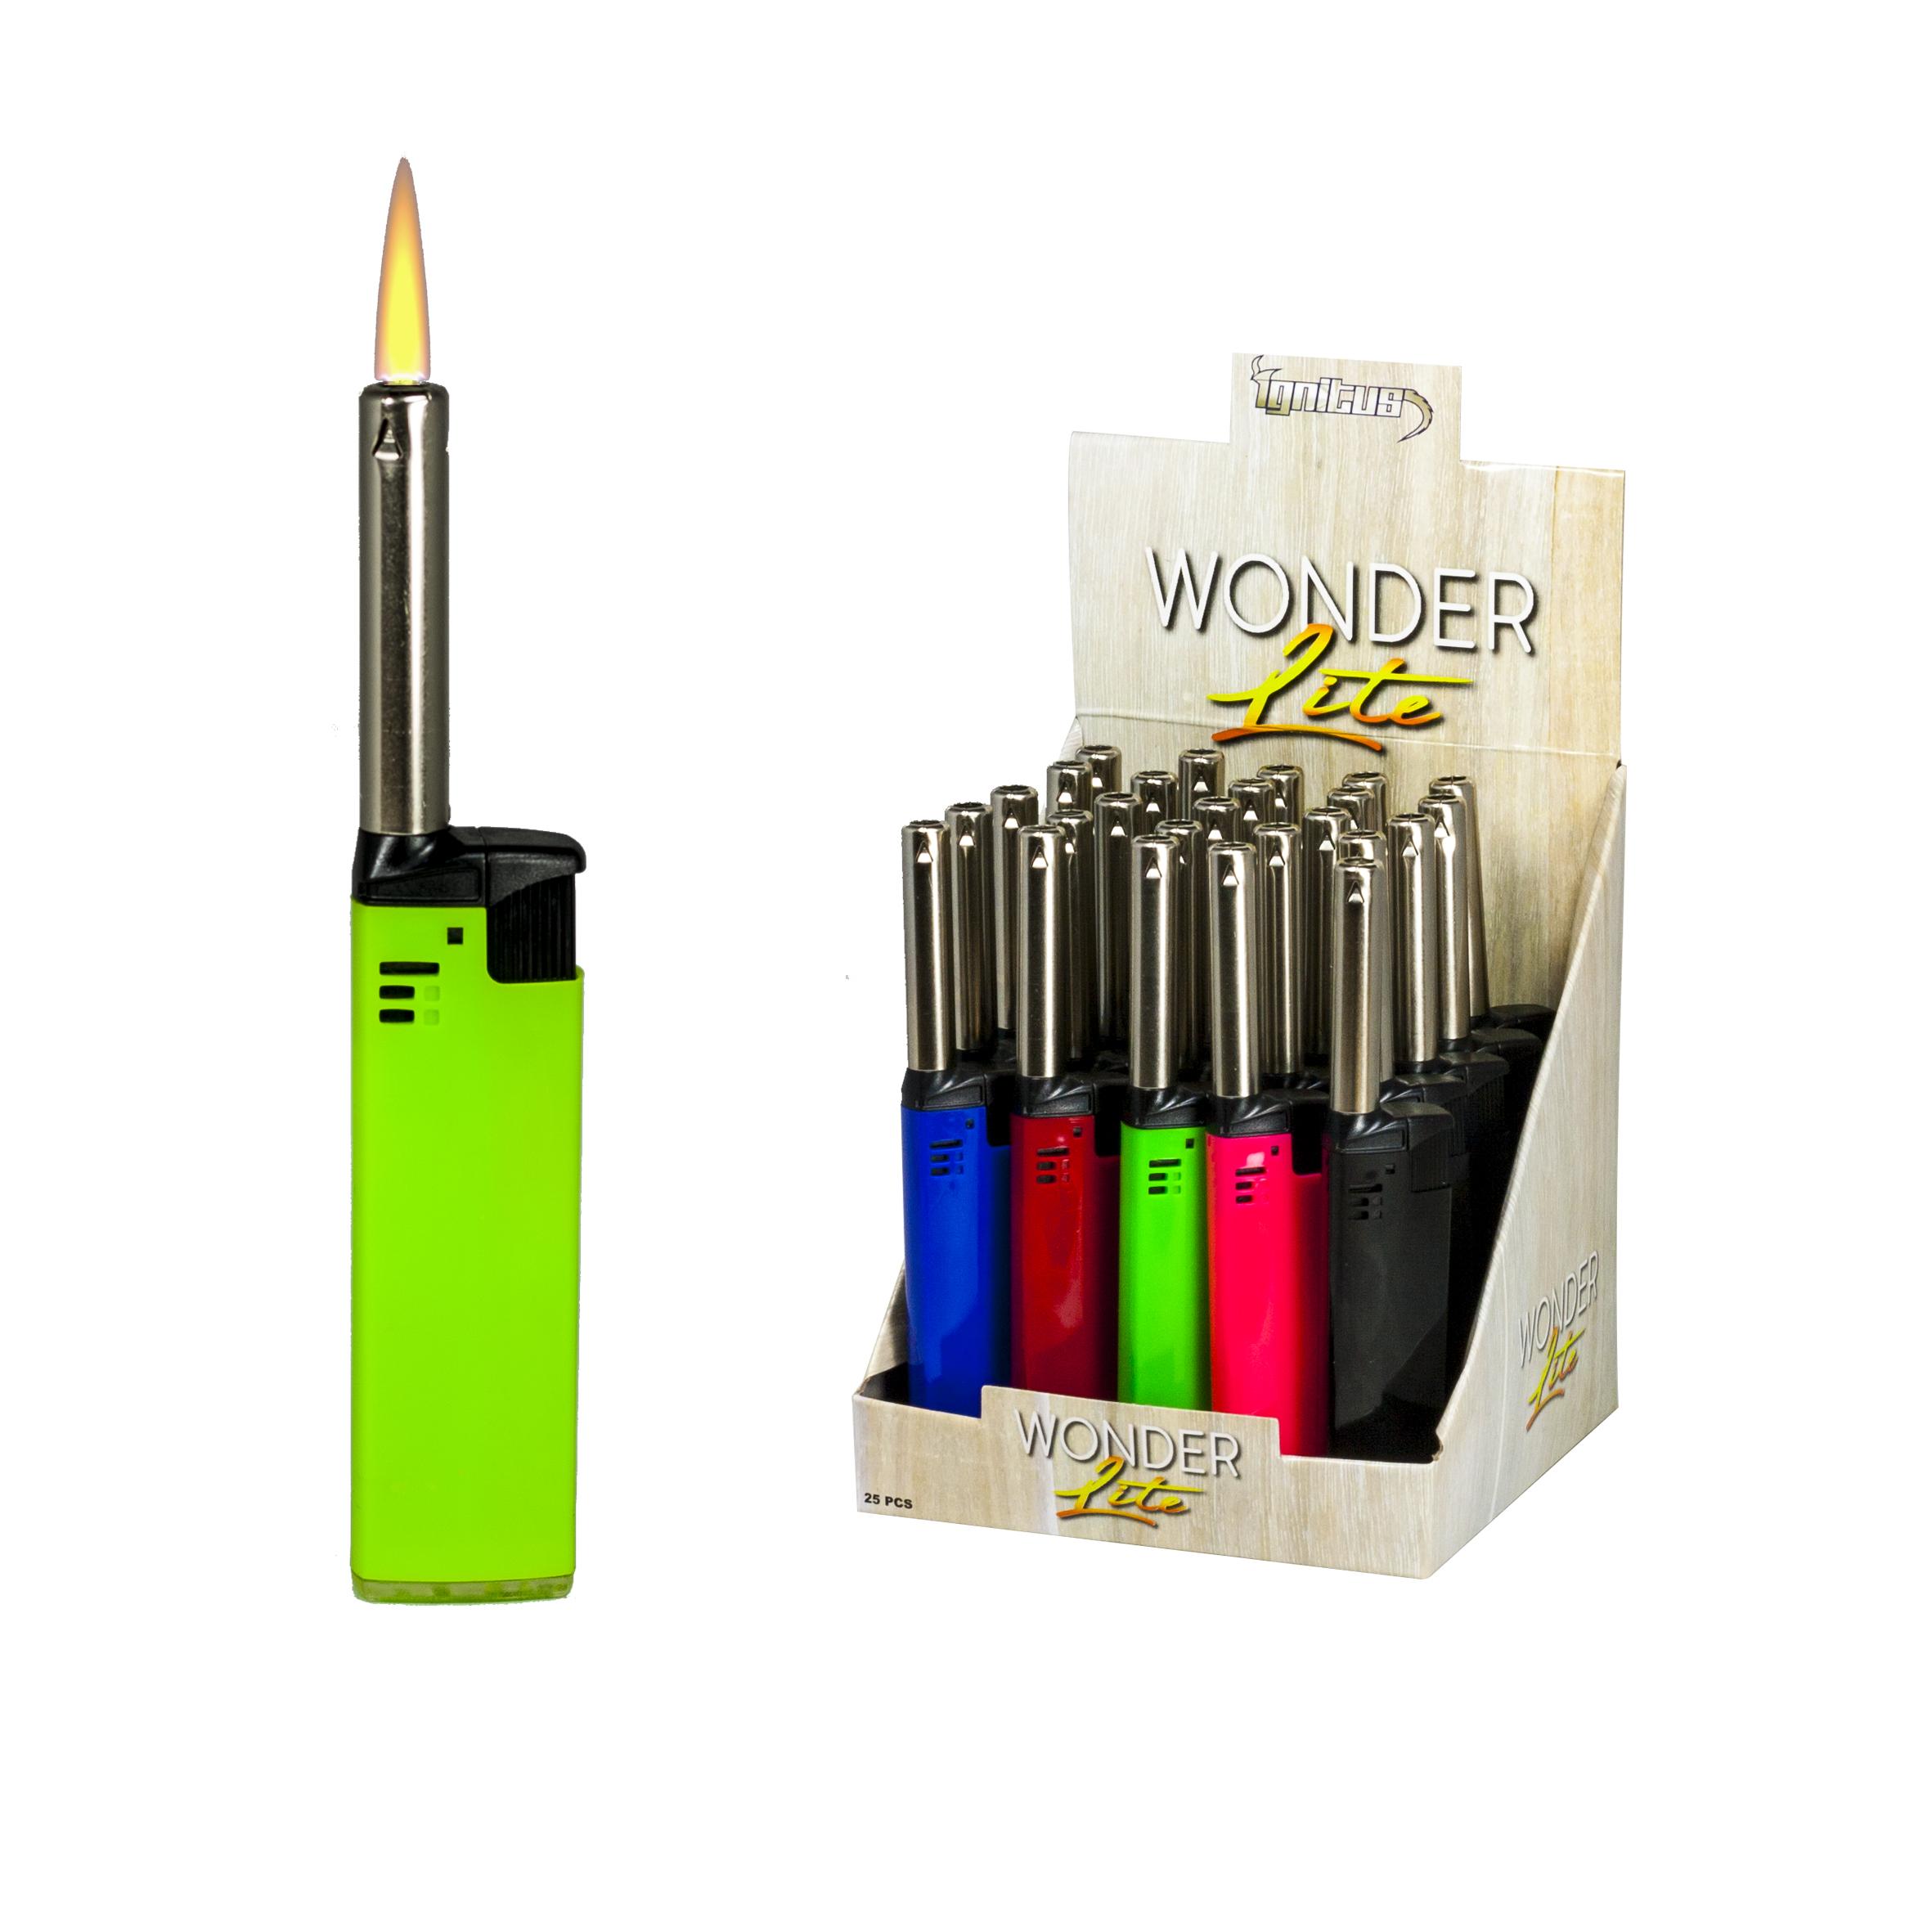 WNDR-MINIMP01 flame